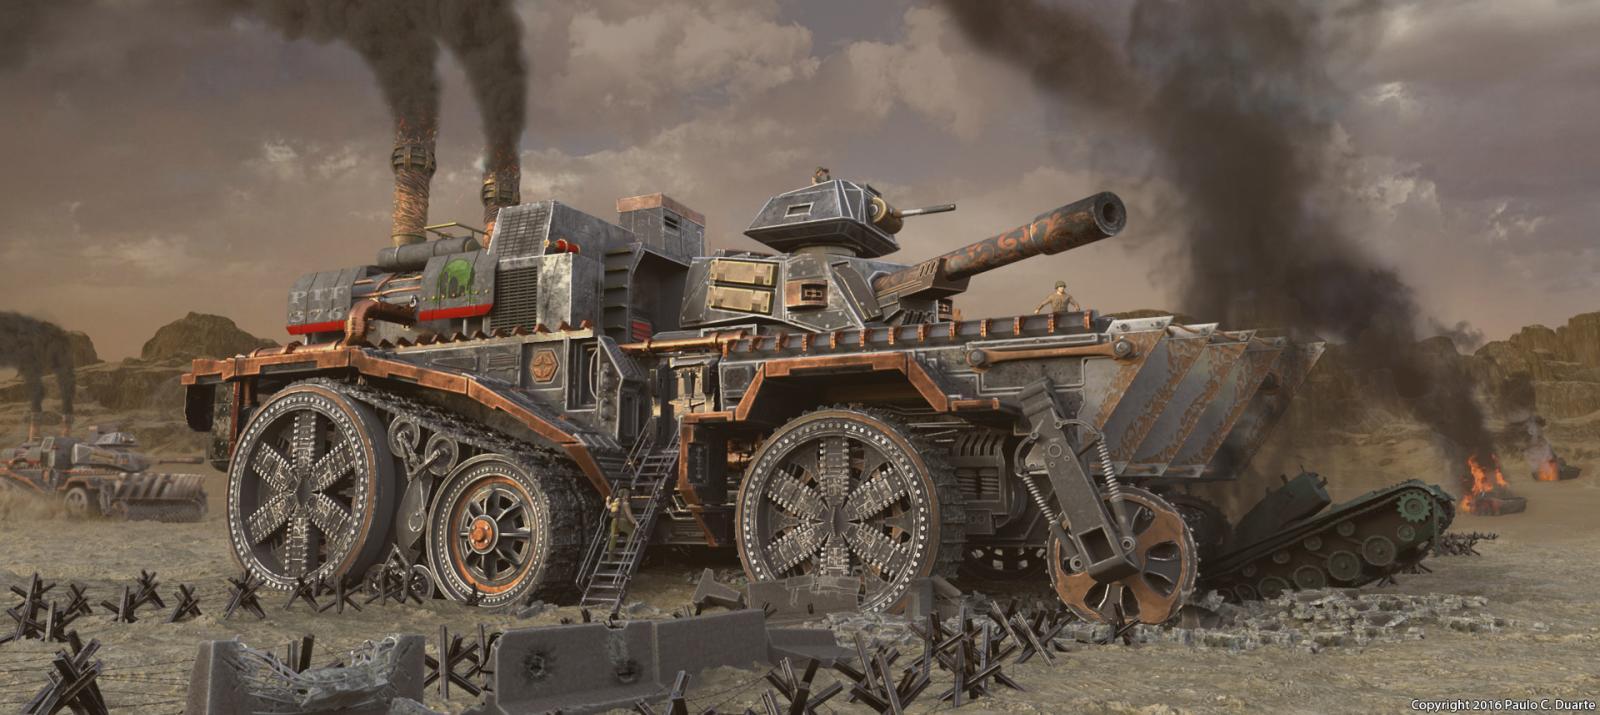 paulo-cesar-duarte-tank-fortress-final.jpg